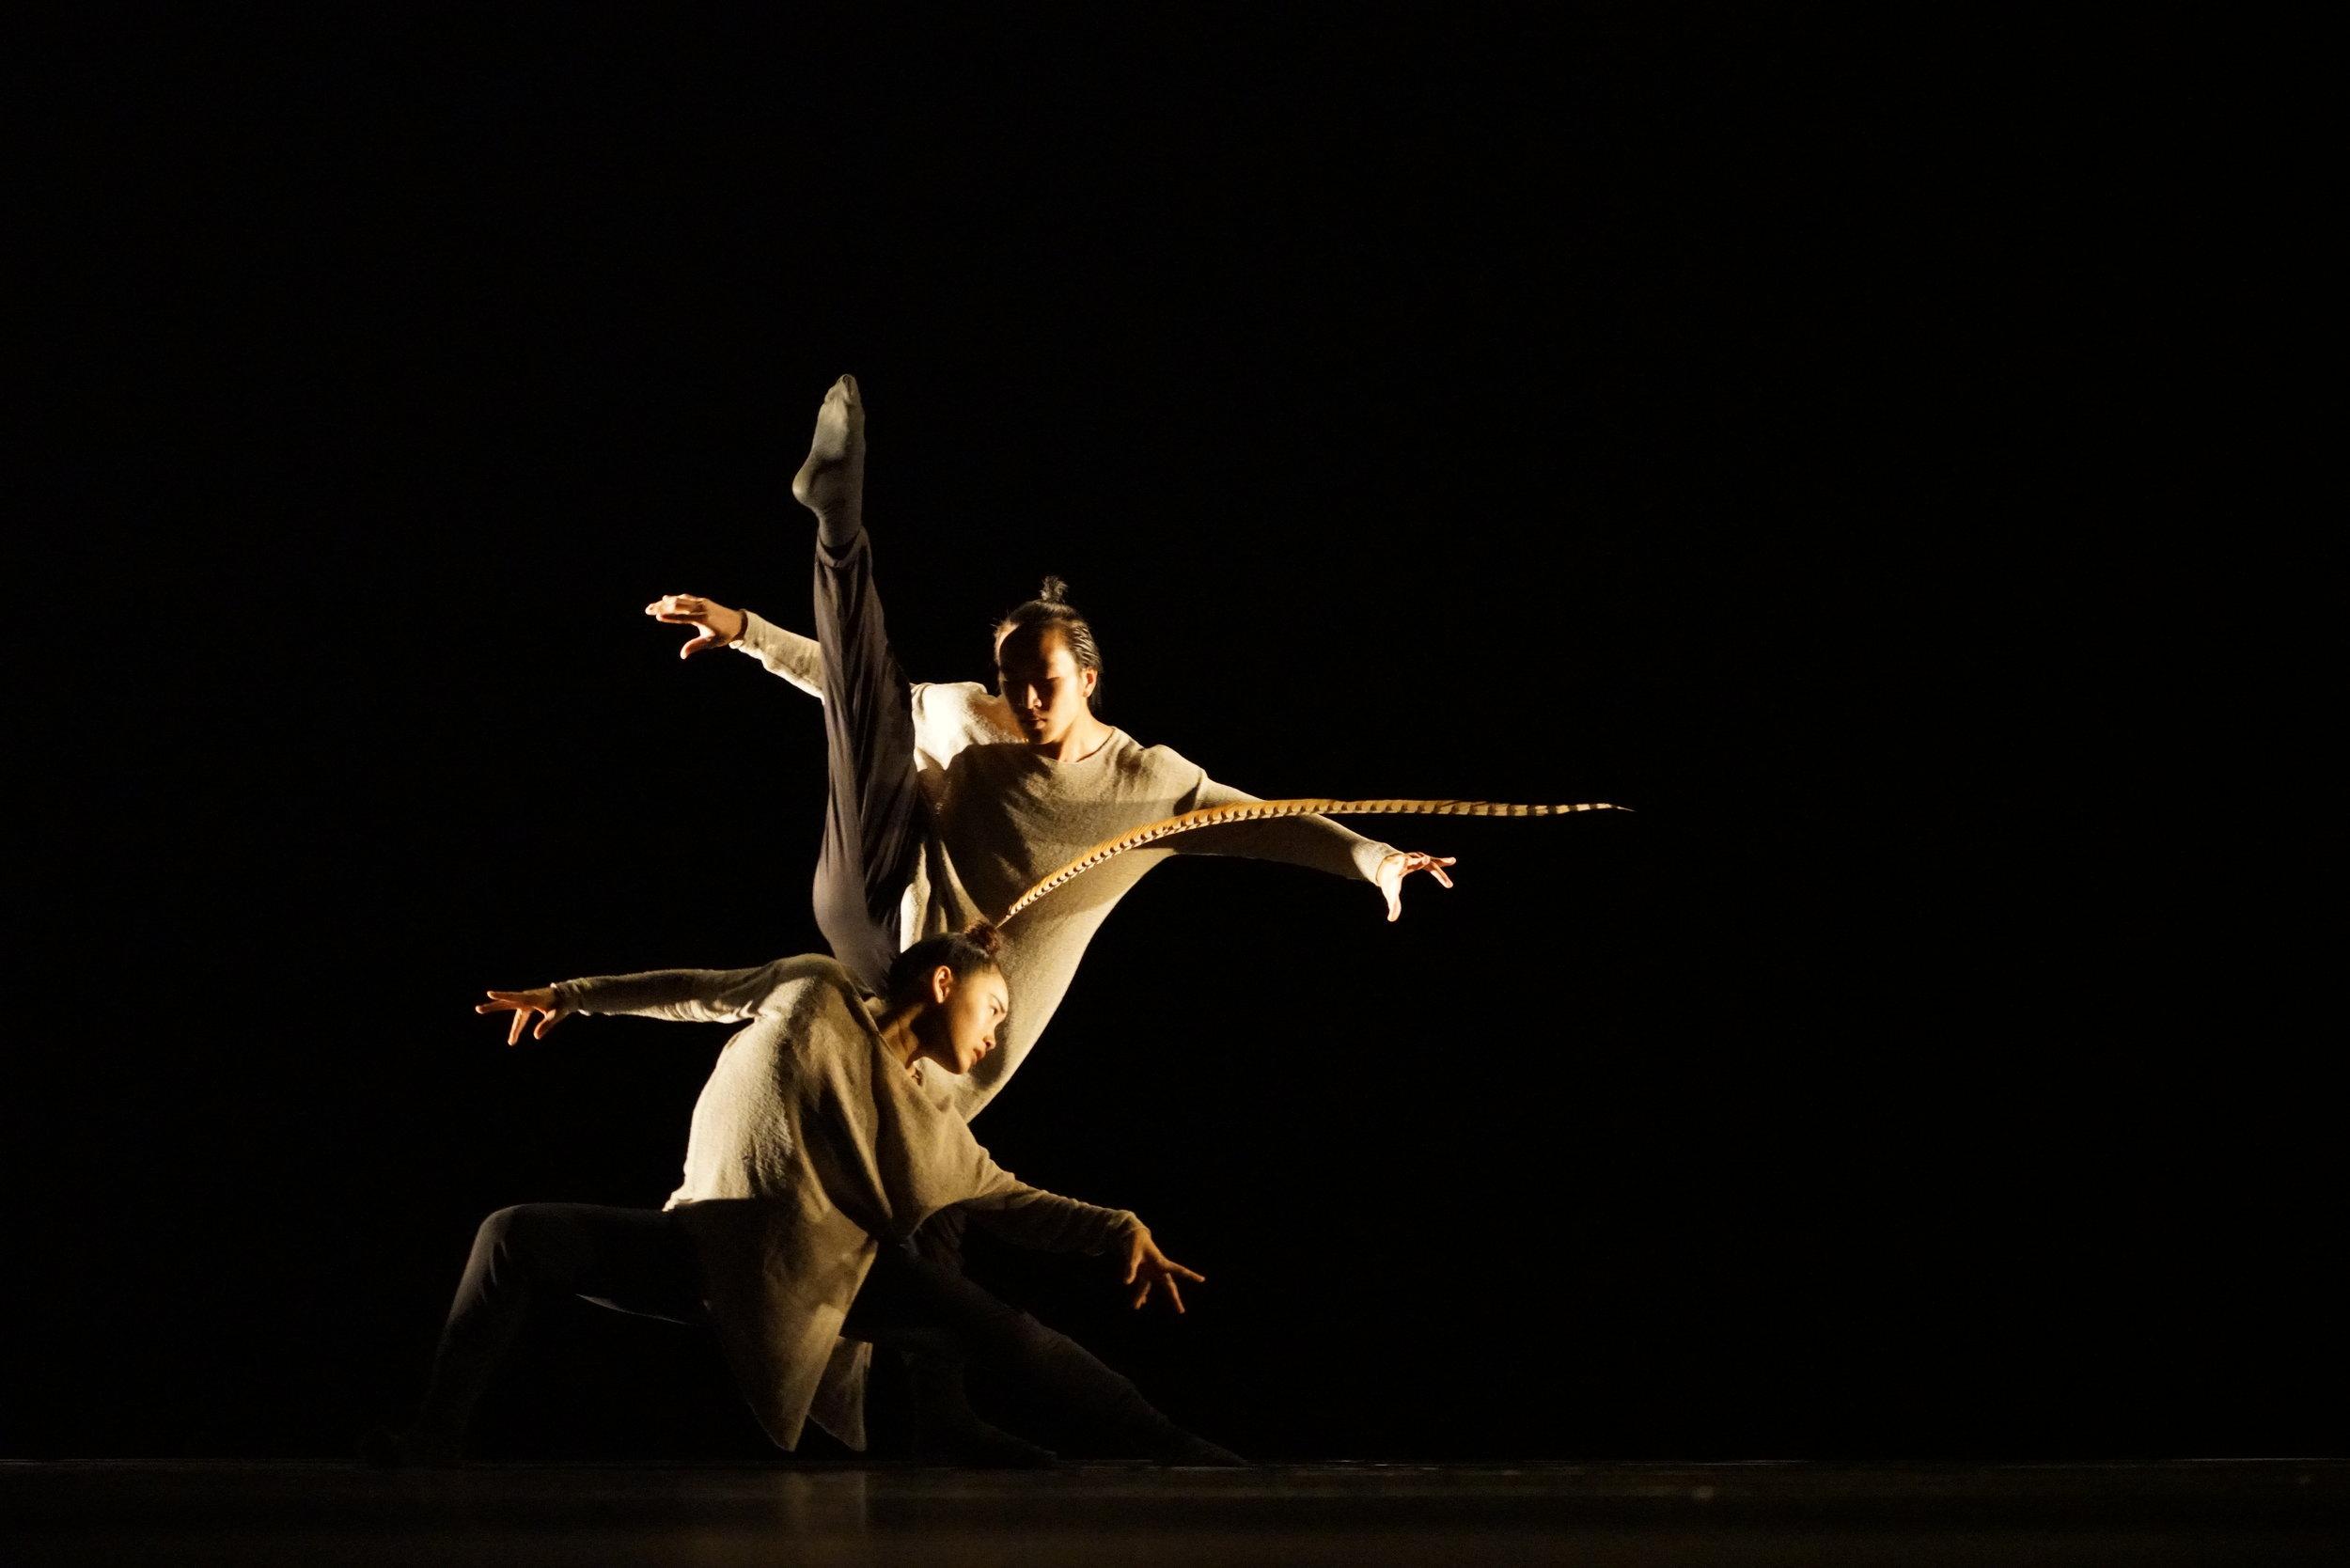 3. Preis -  Birdy, Hung-Chung Lai, .JPG